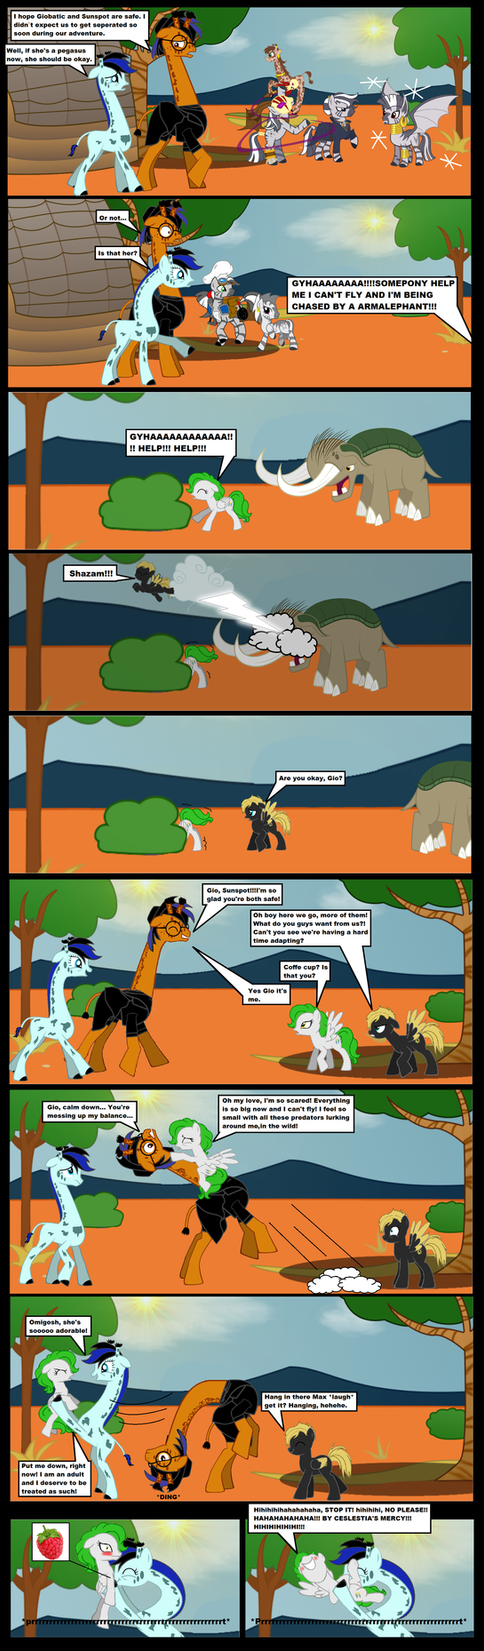 The pegaraffe disease 8 by darkoak213